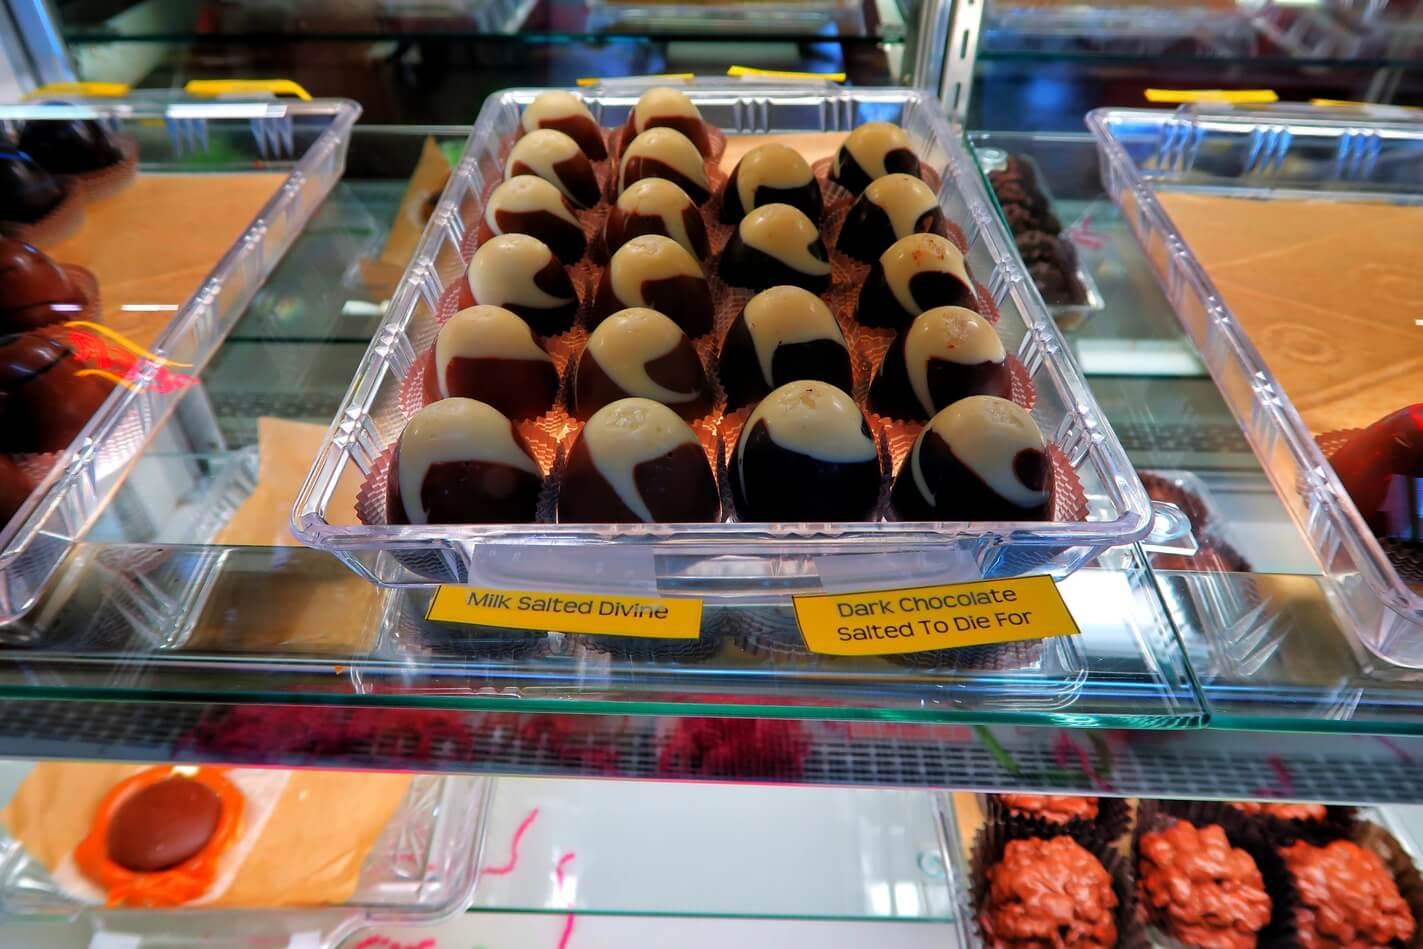 Tiramisu Homemade Candy - Expressions Unlimited